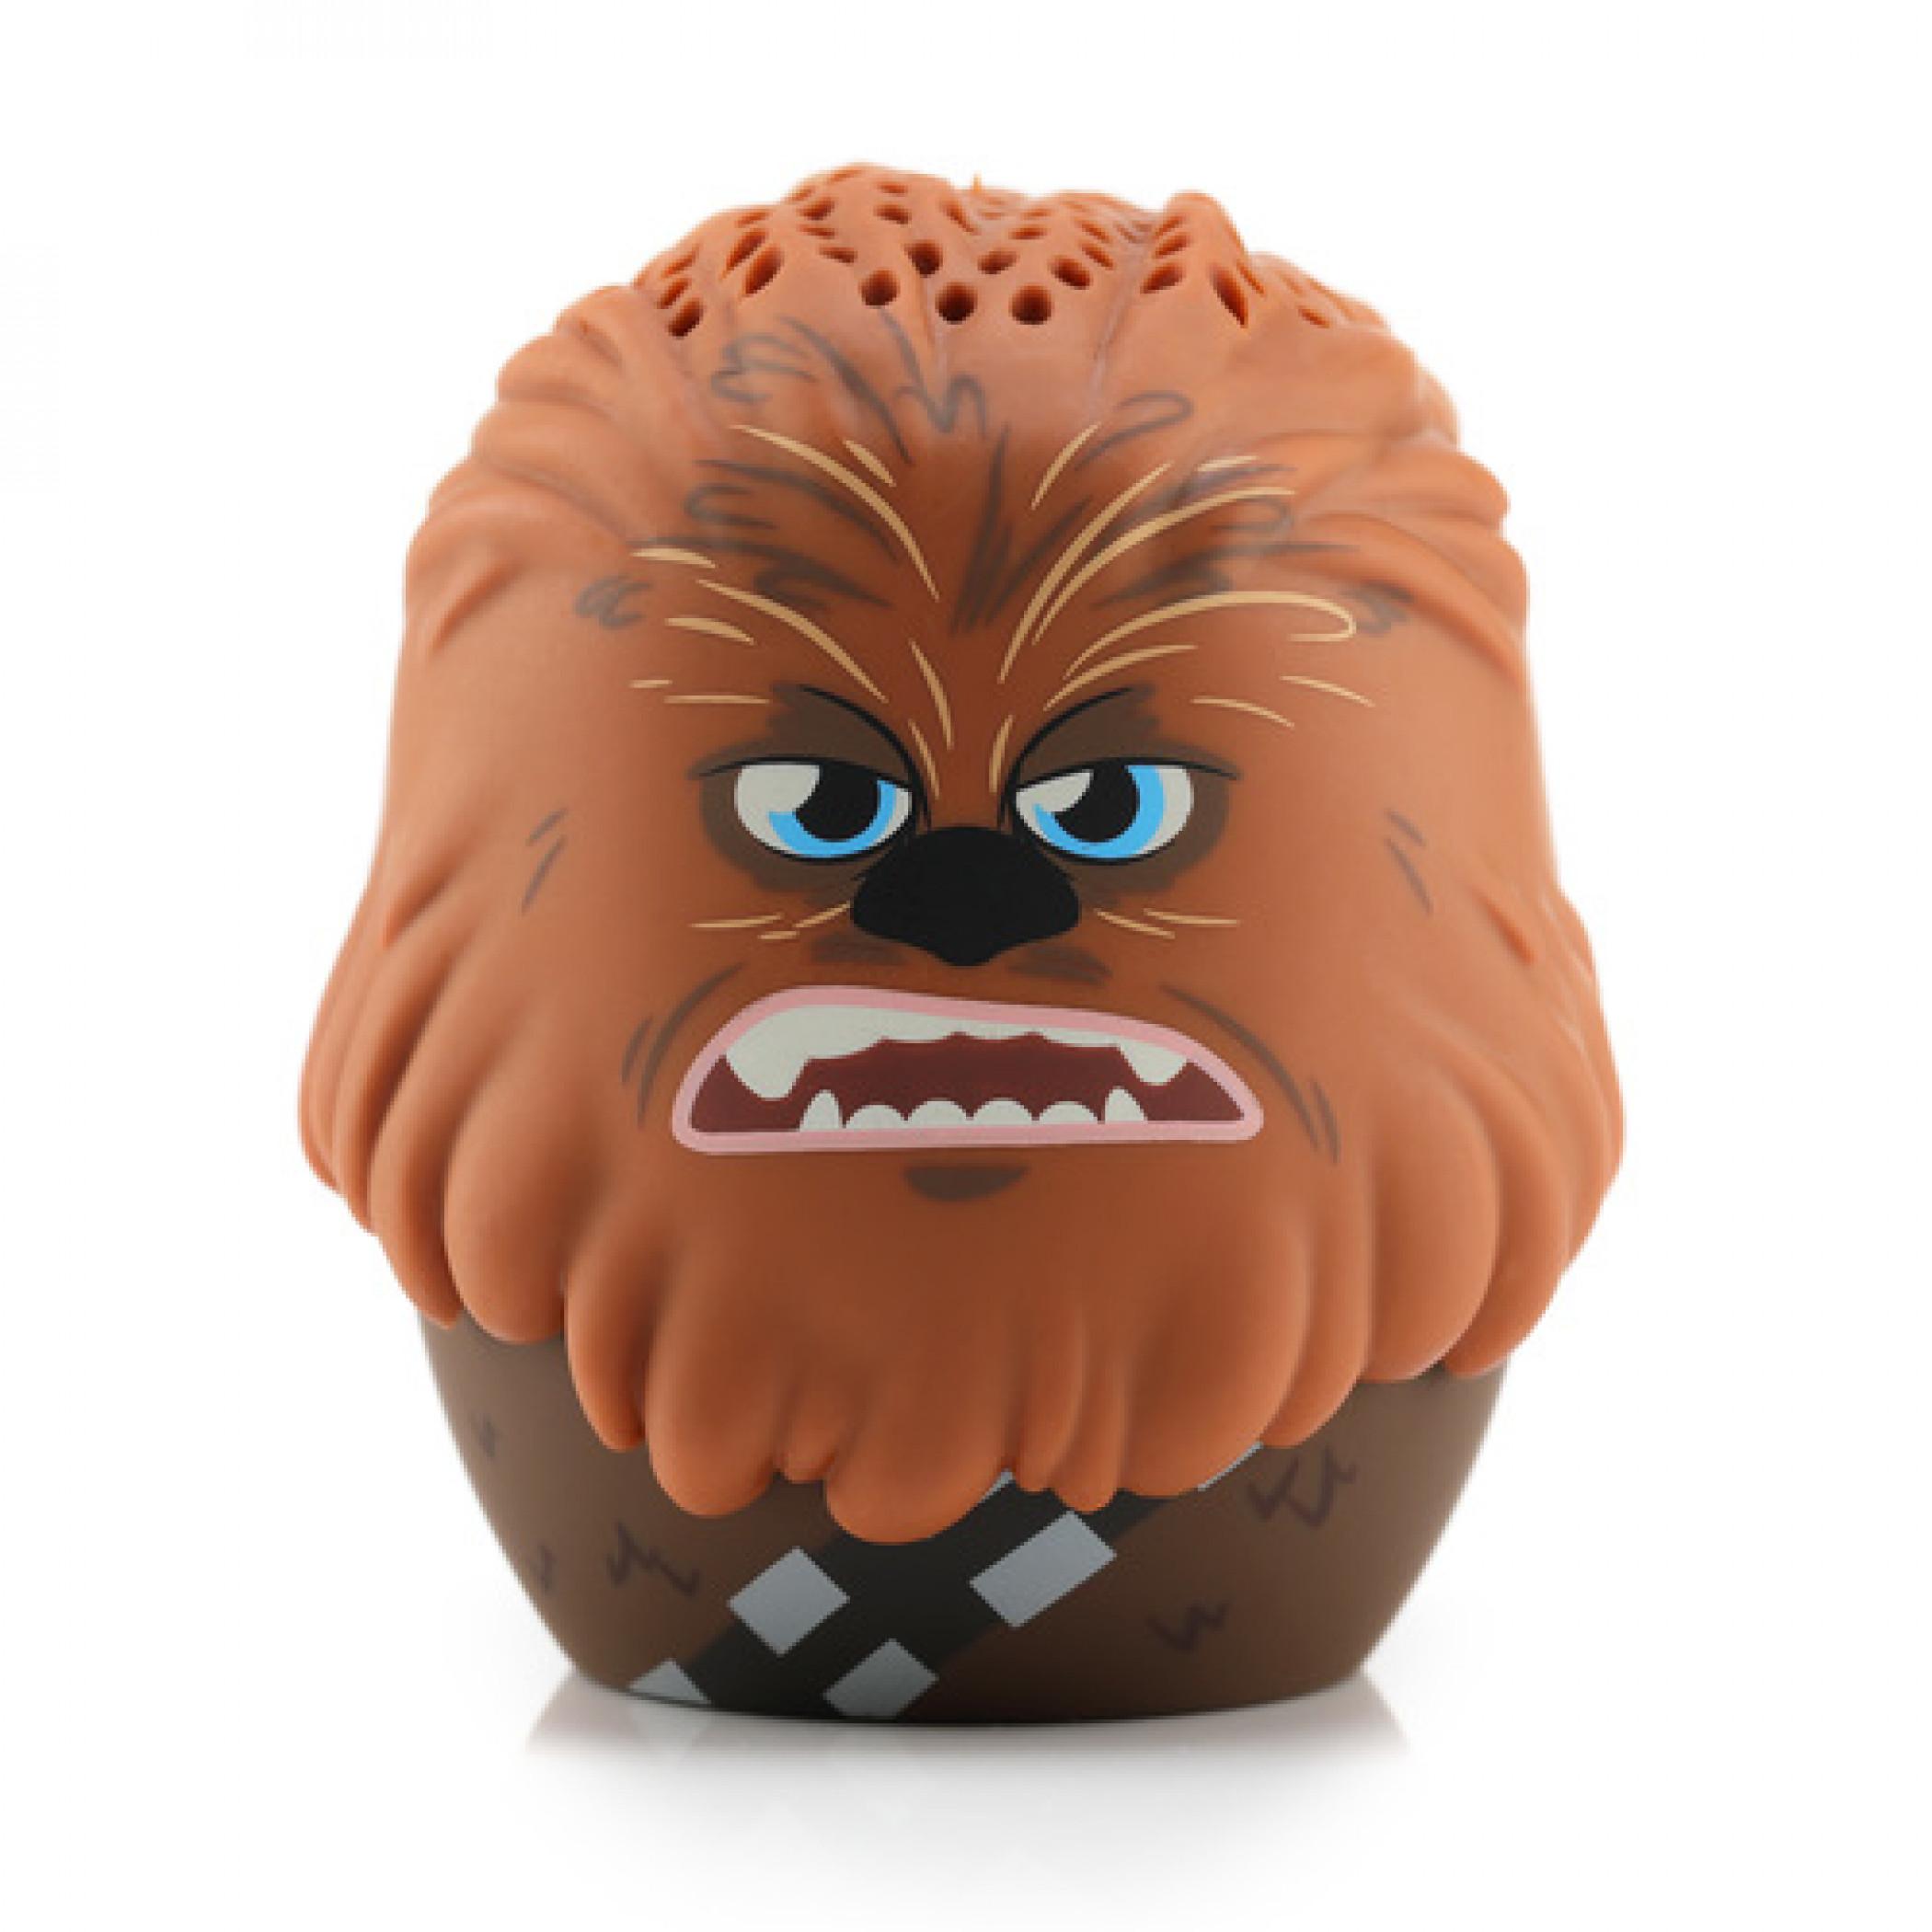 Star Wars Chewbacca Bitty Boomers Bluetooth Speaker